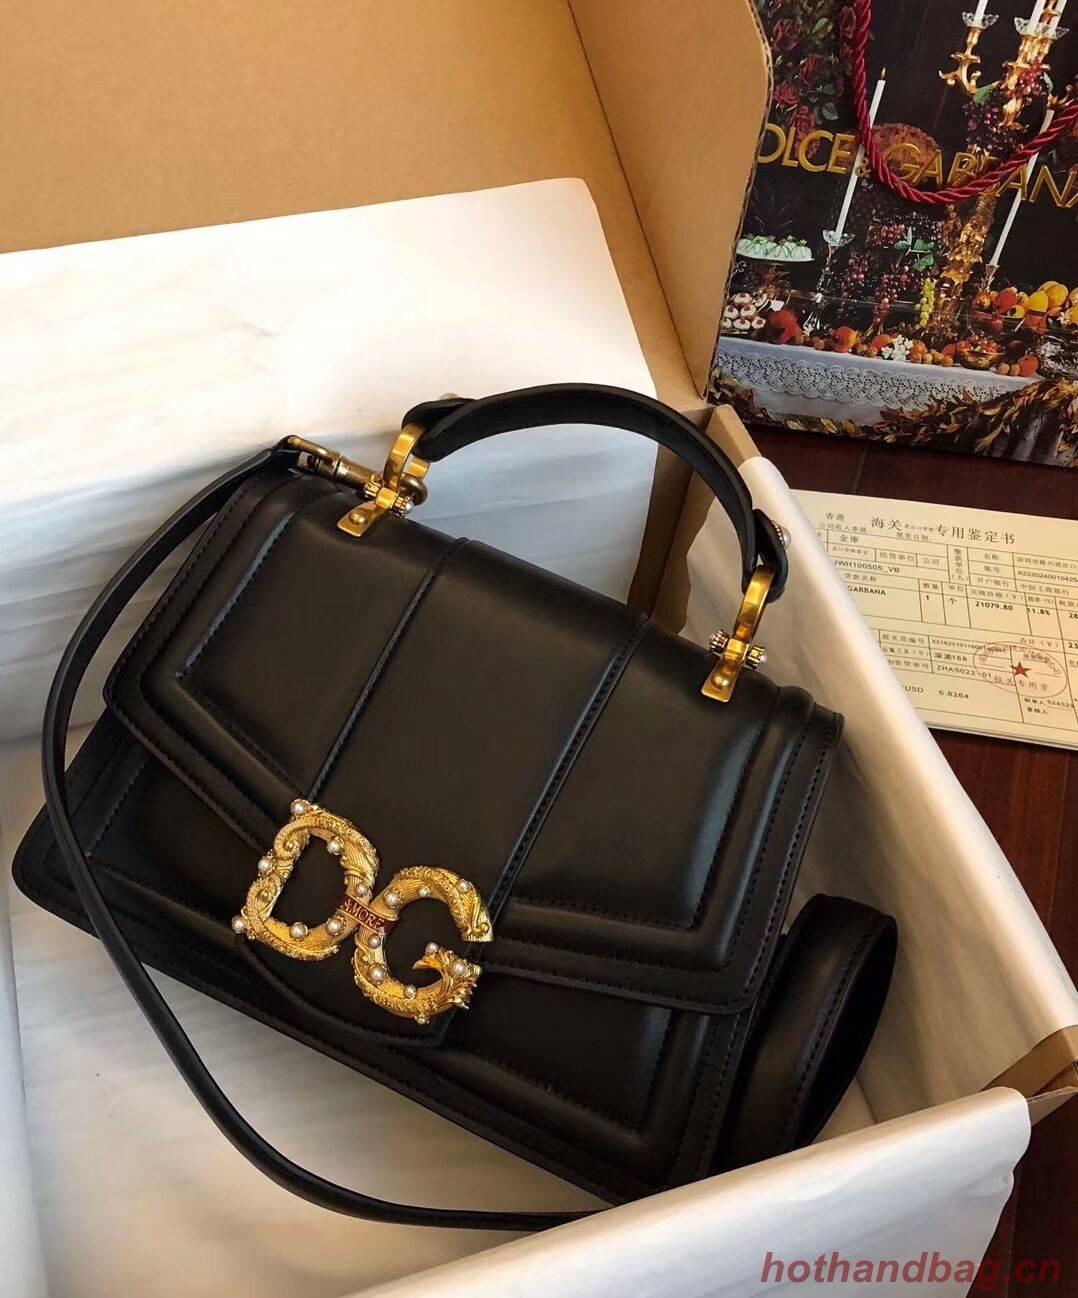 Dolce & Gabbana Origianl Leather Bag 4916 Black